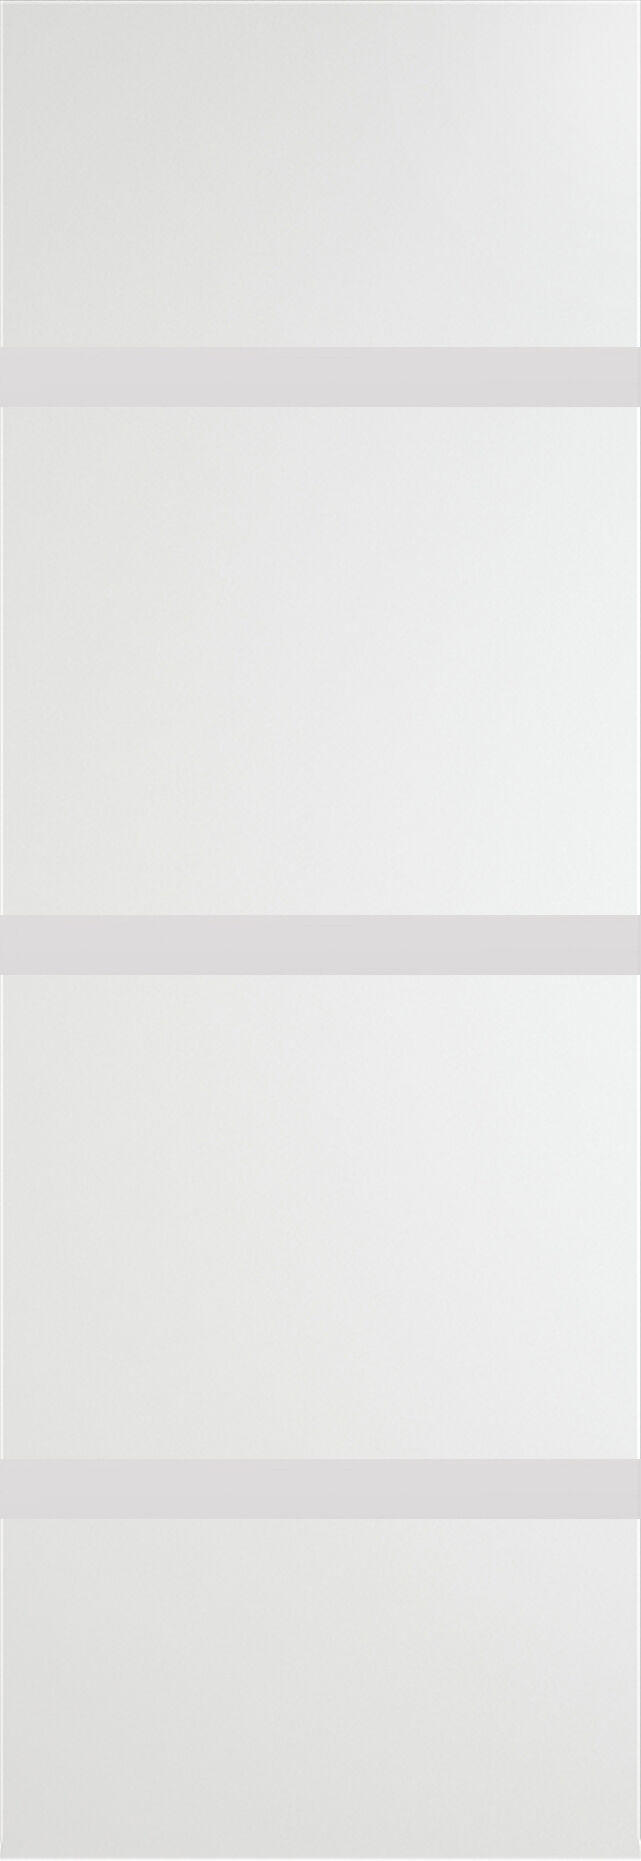 Tivoli Г-4 Invisible цвет - Белая эмаль Без стекла (ДГ)